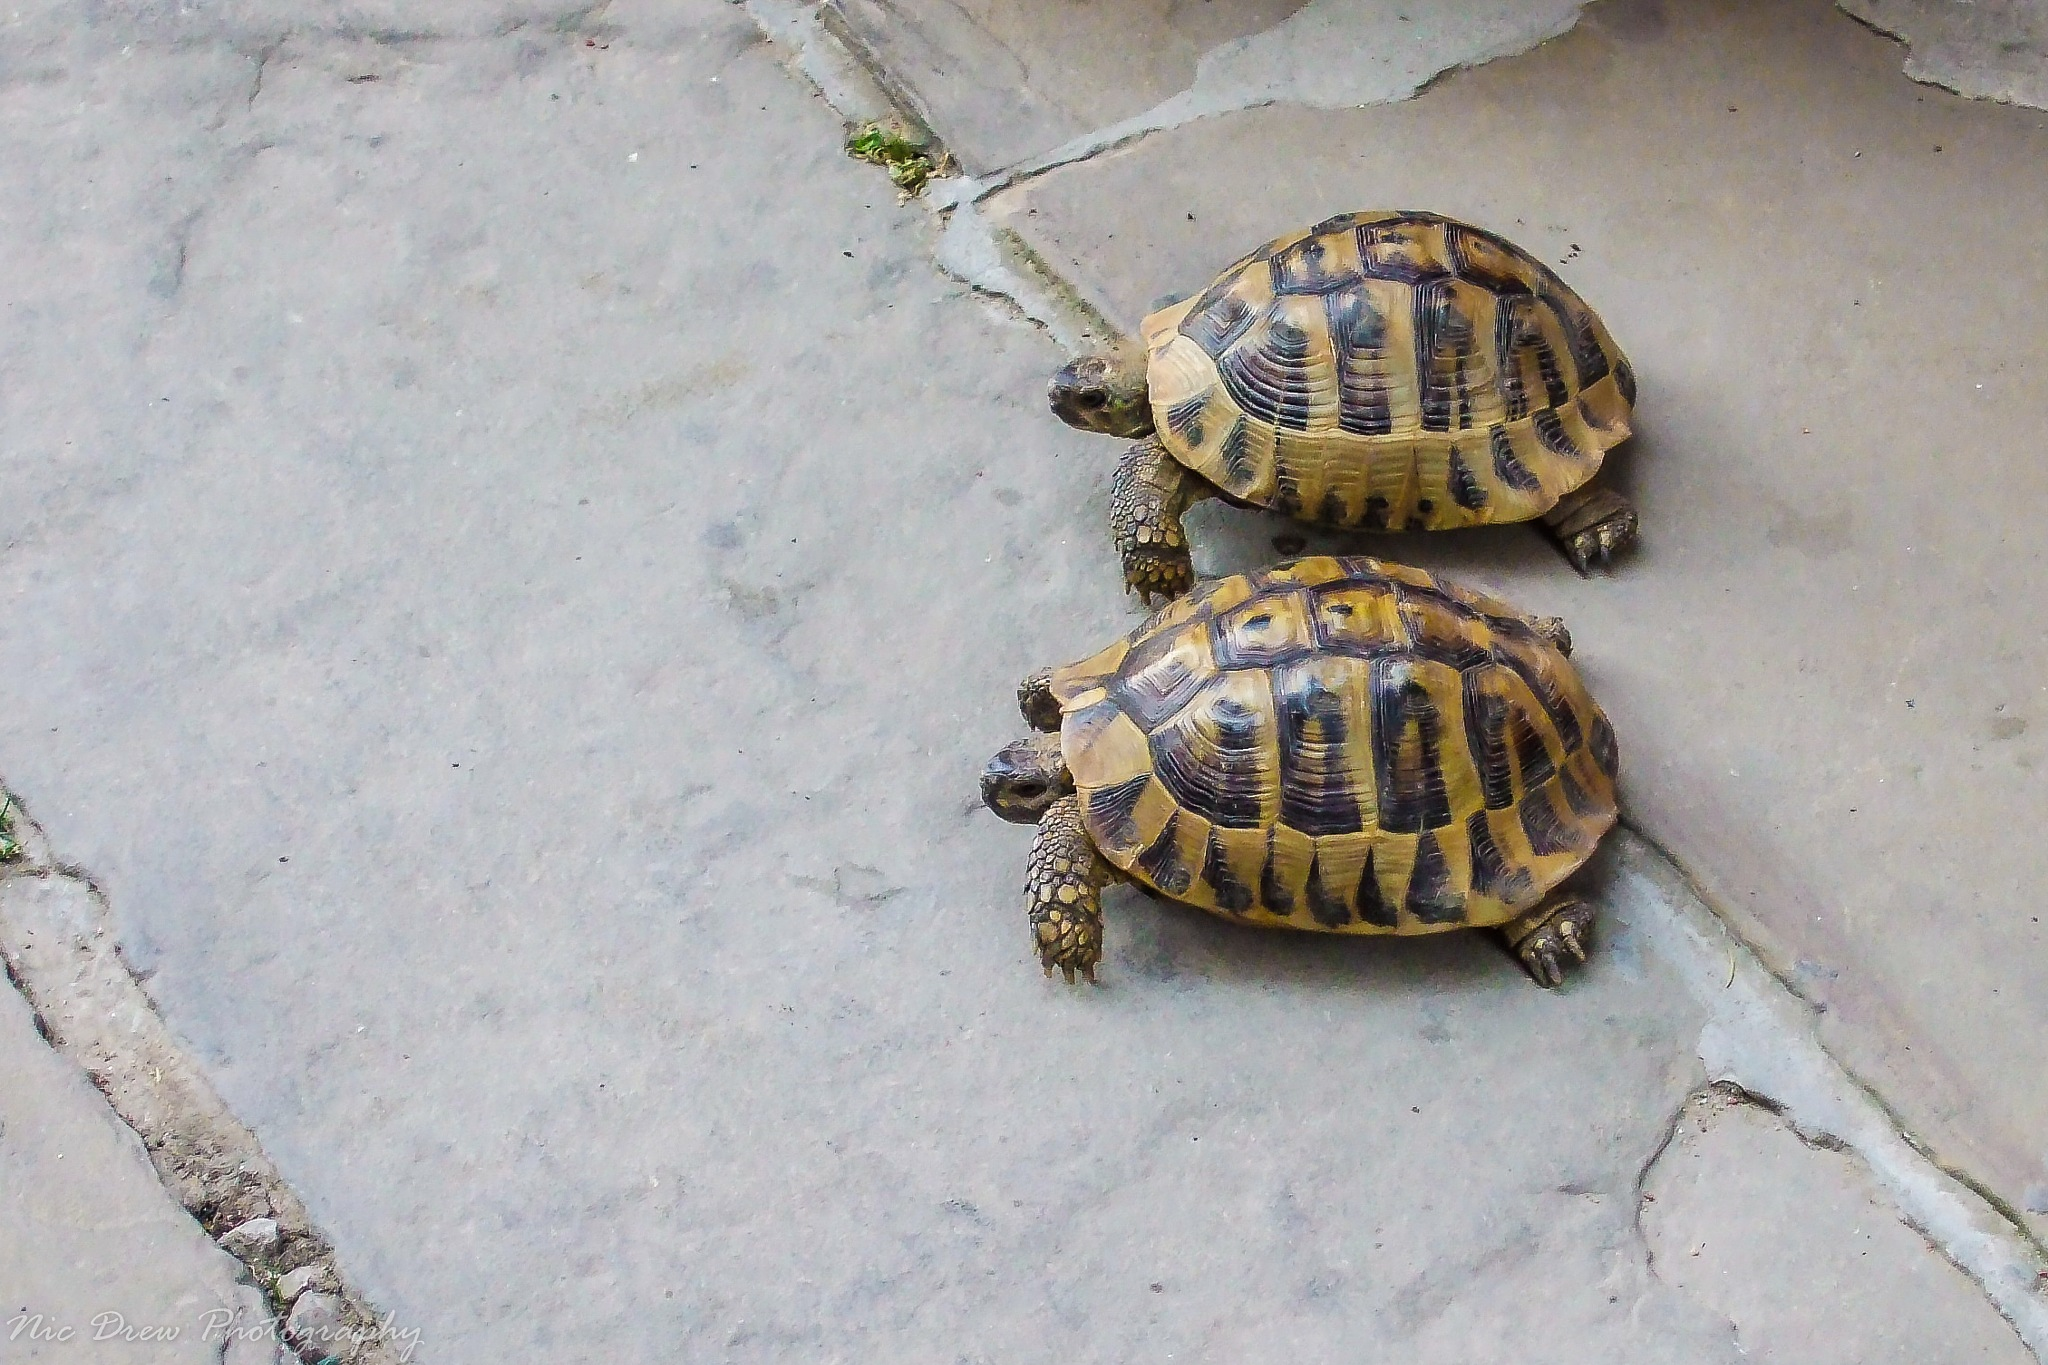 Racing tortoises by Nic Drew